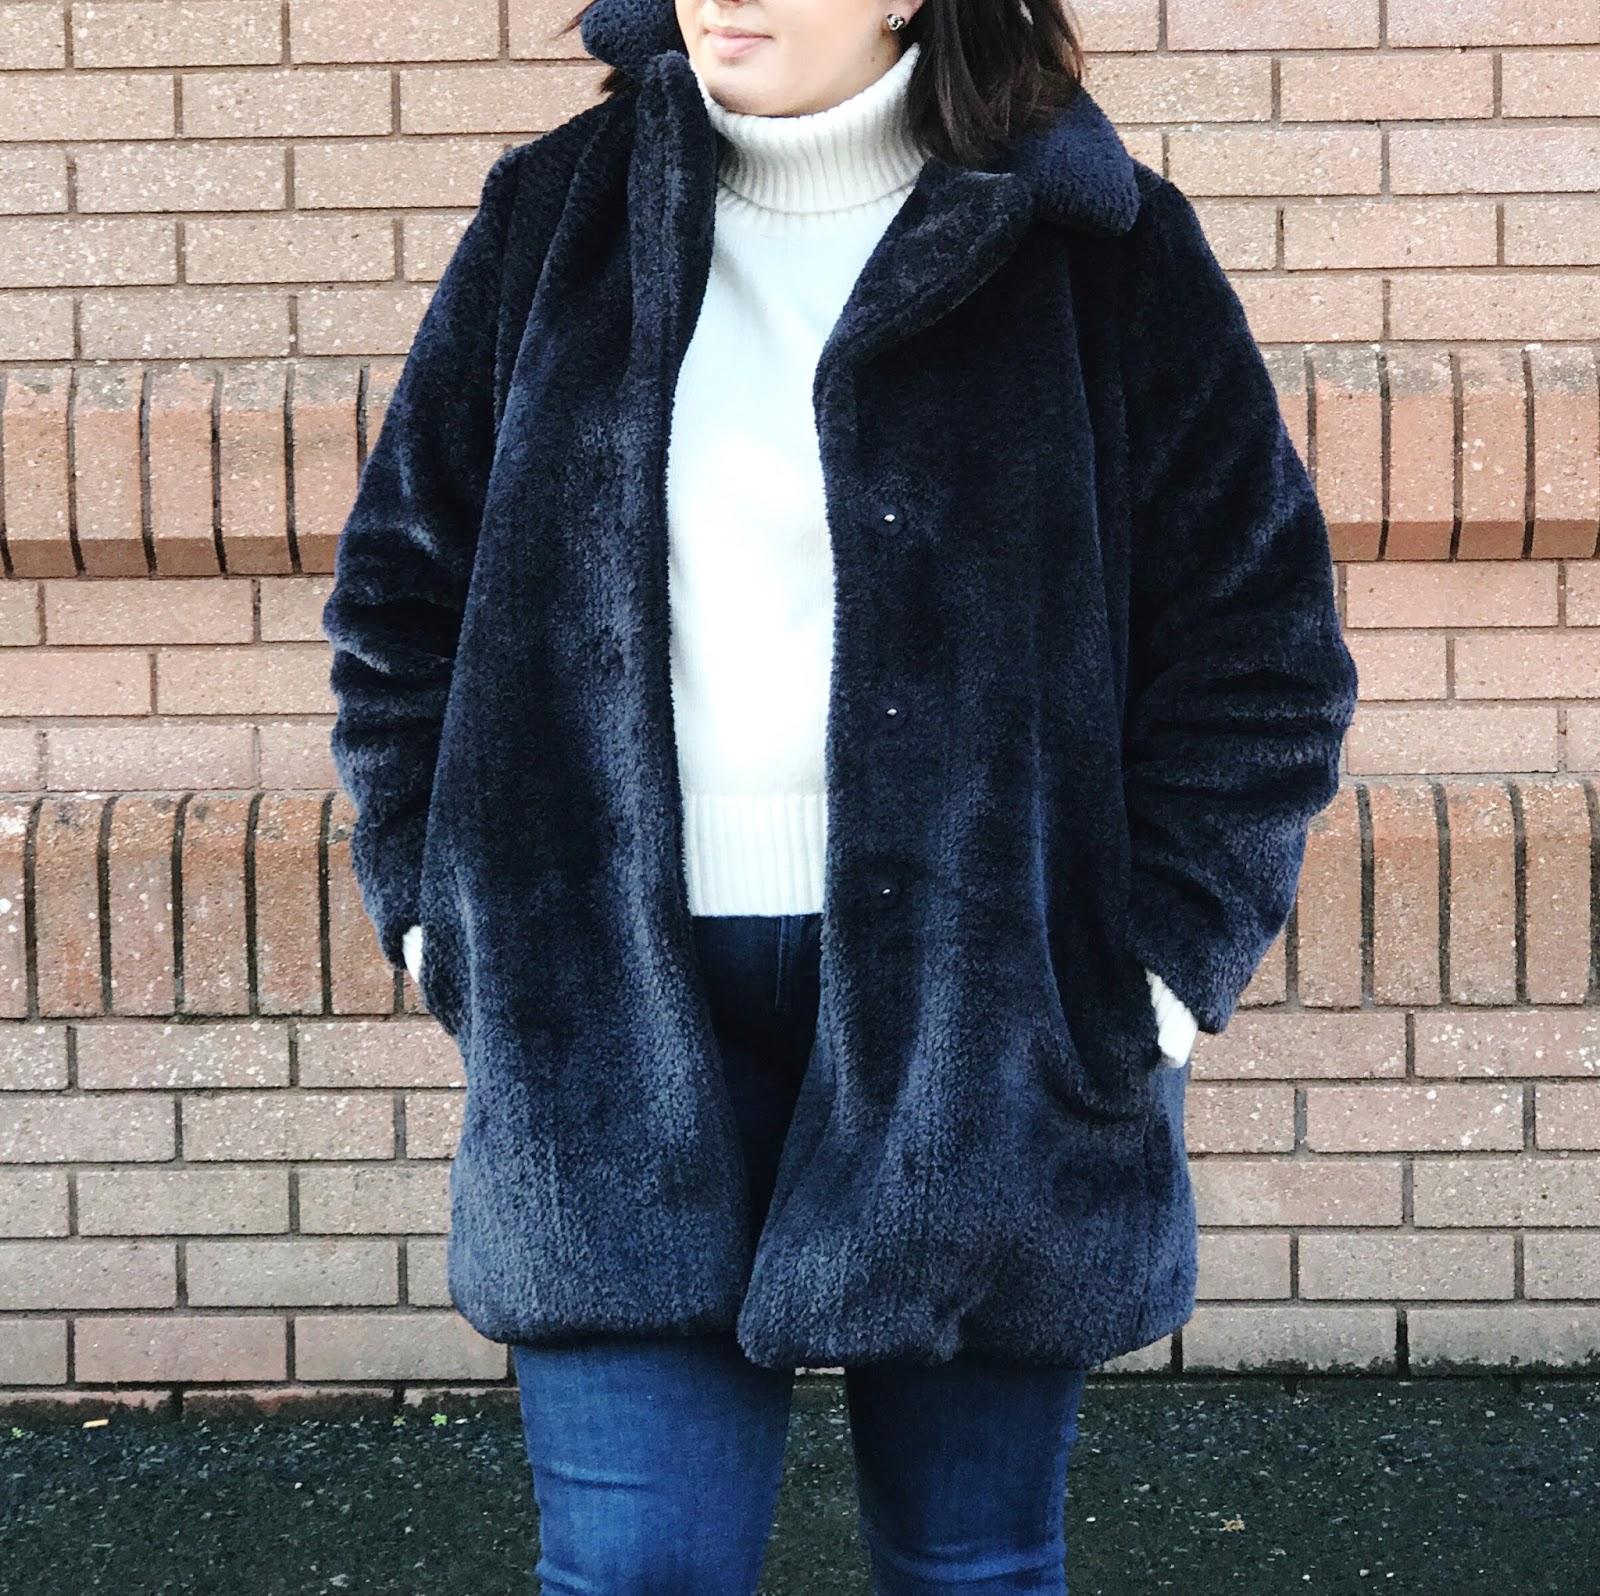 Getting my dream hair at la bella vita that belfast girl the 2499 coat you need in your life pmusecretfo Choice Image